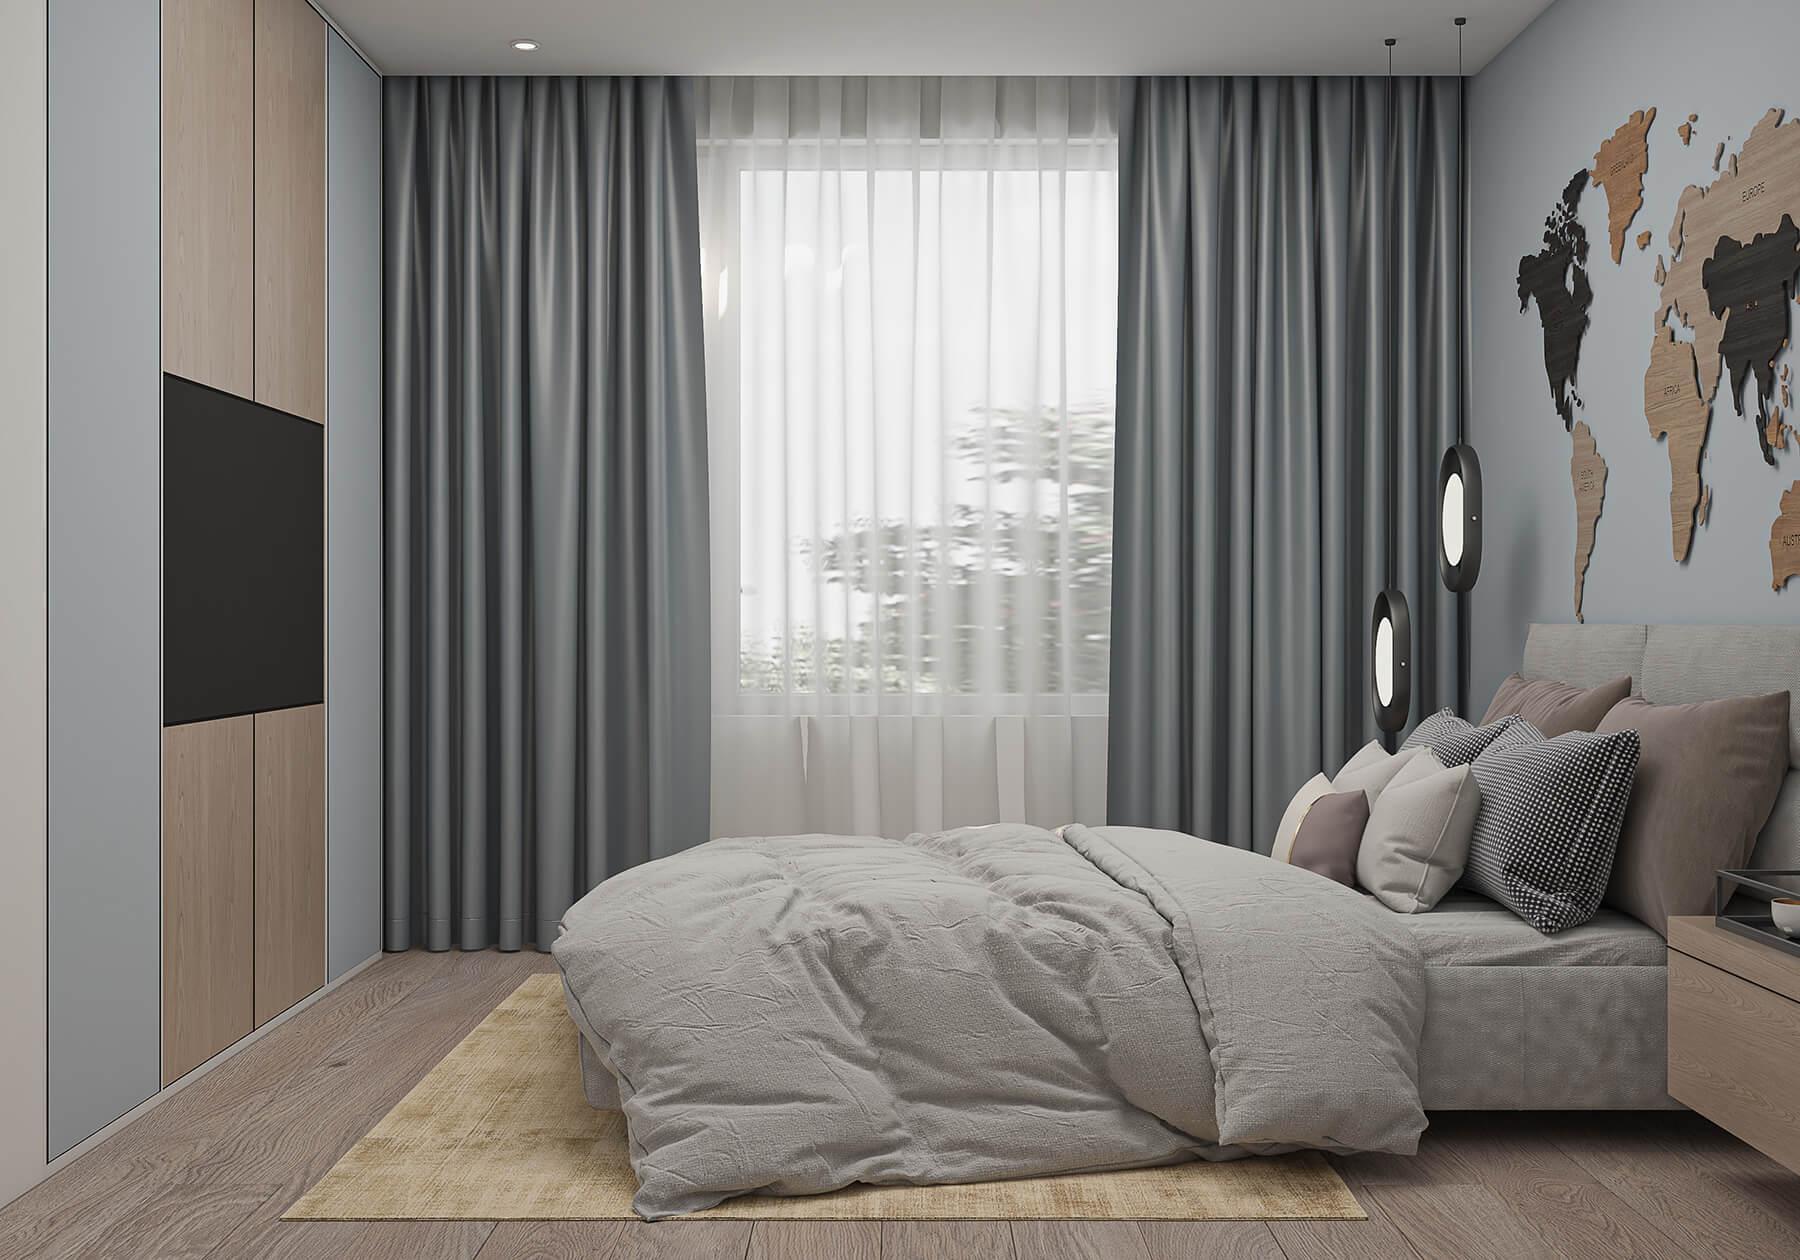 interioren-dizain-proekt-na-spalnya-anika